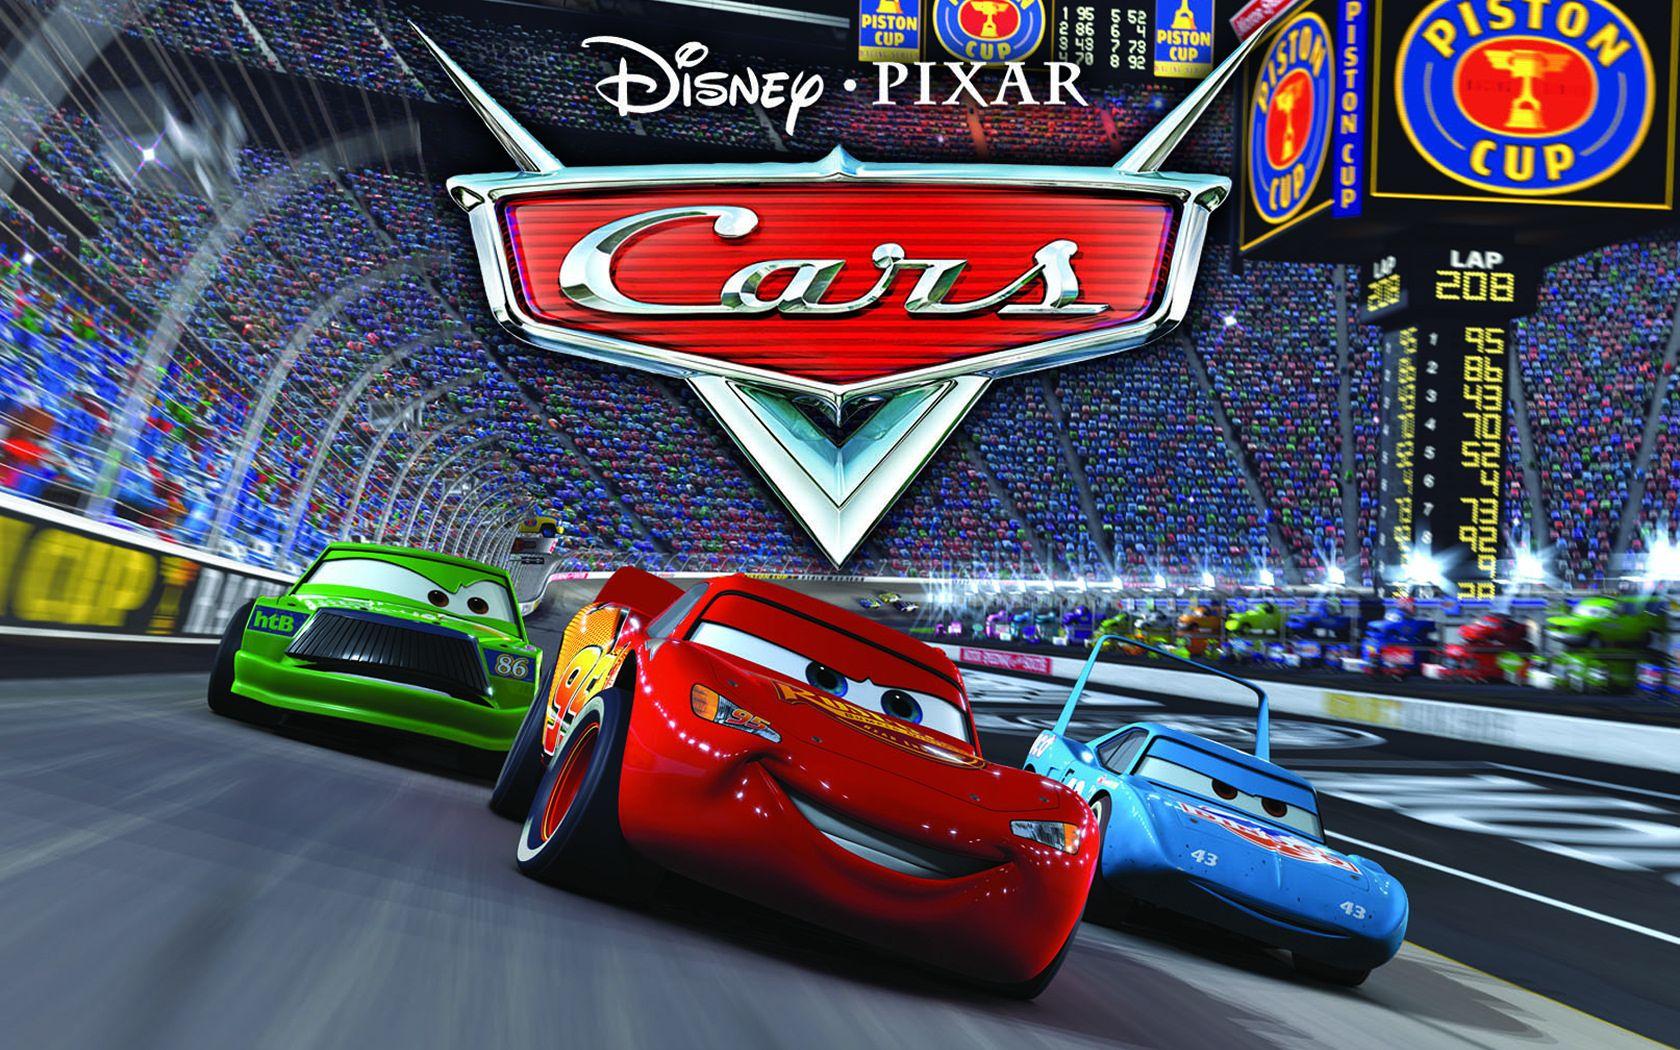 Disney cars pinterest tumblr google yahoo imgur wallpapers disney cars images